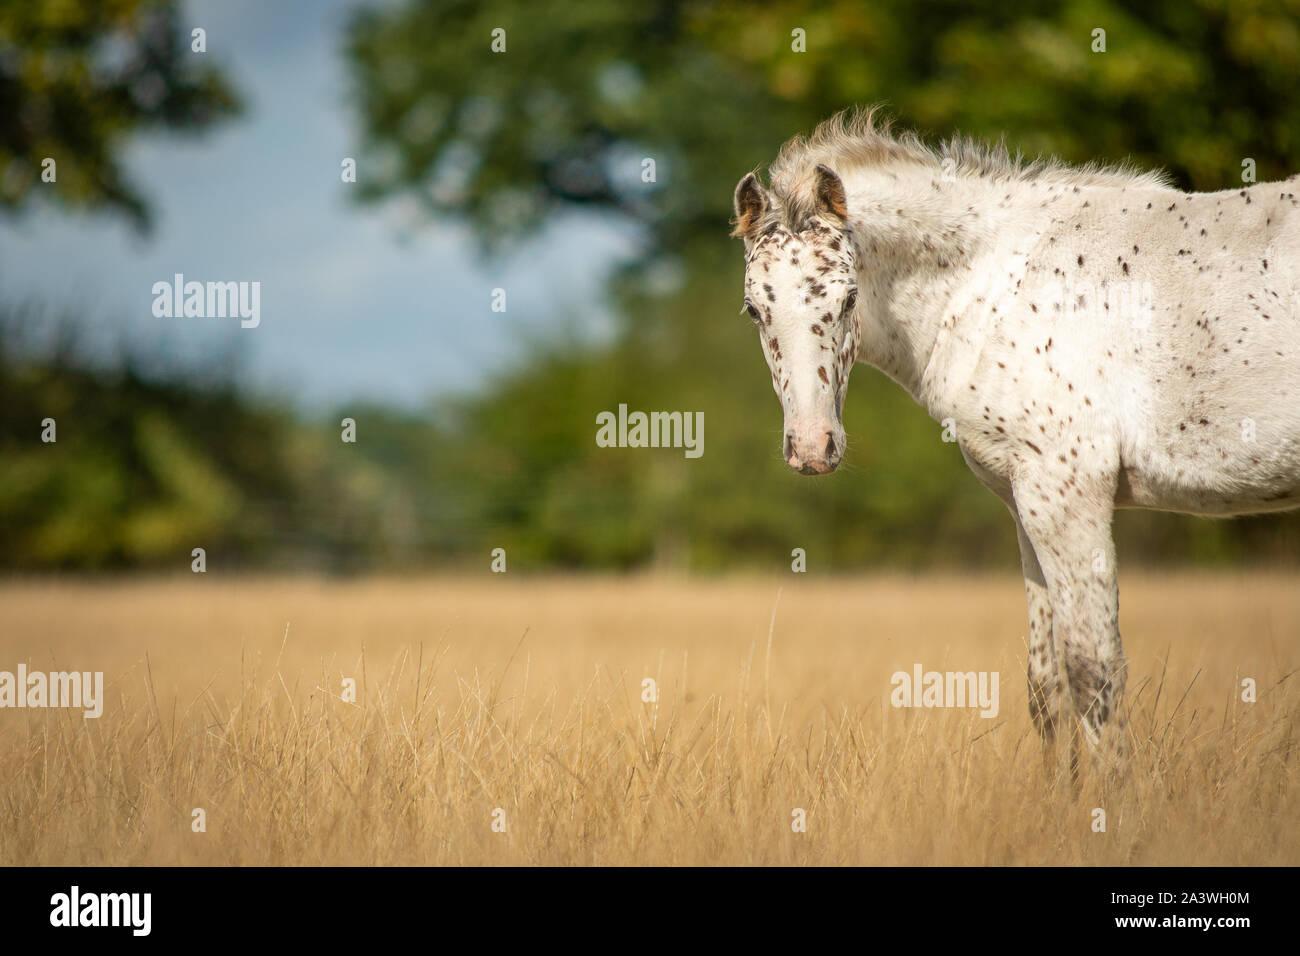 Knabstrupper Appaloosa Spotted Pony Foal in Grass Pasture Stock Photo